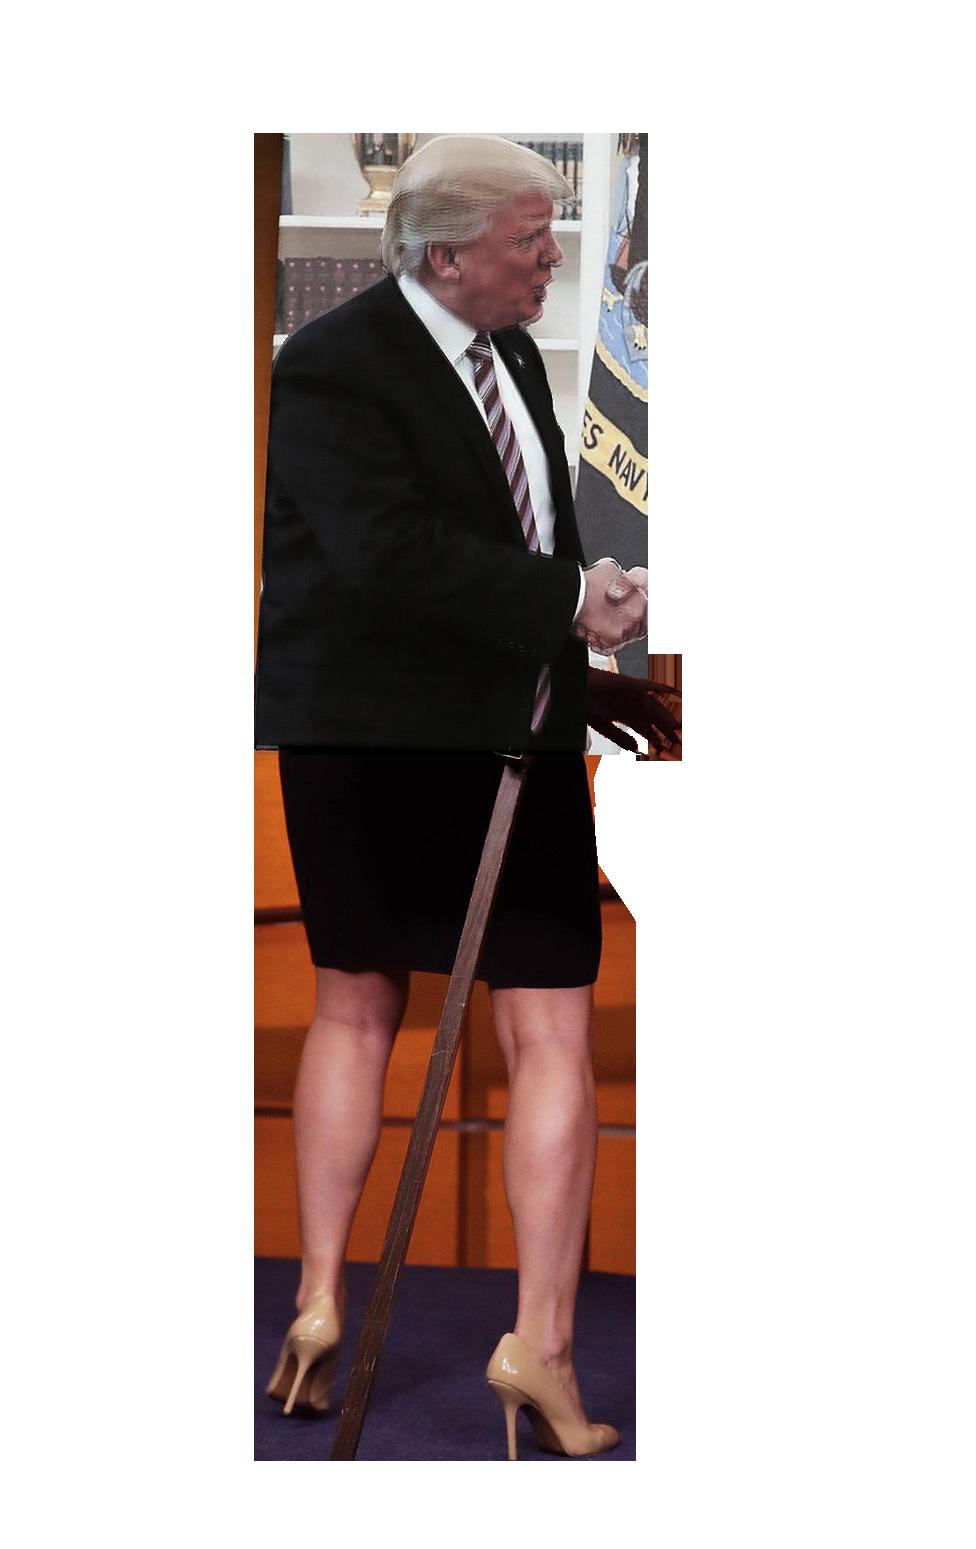 Politics clipart politician speech. Donald trump image with